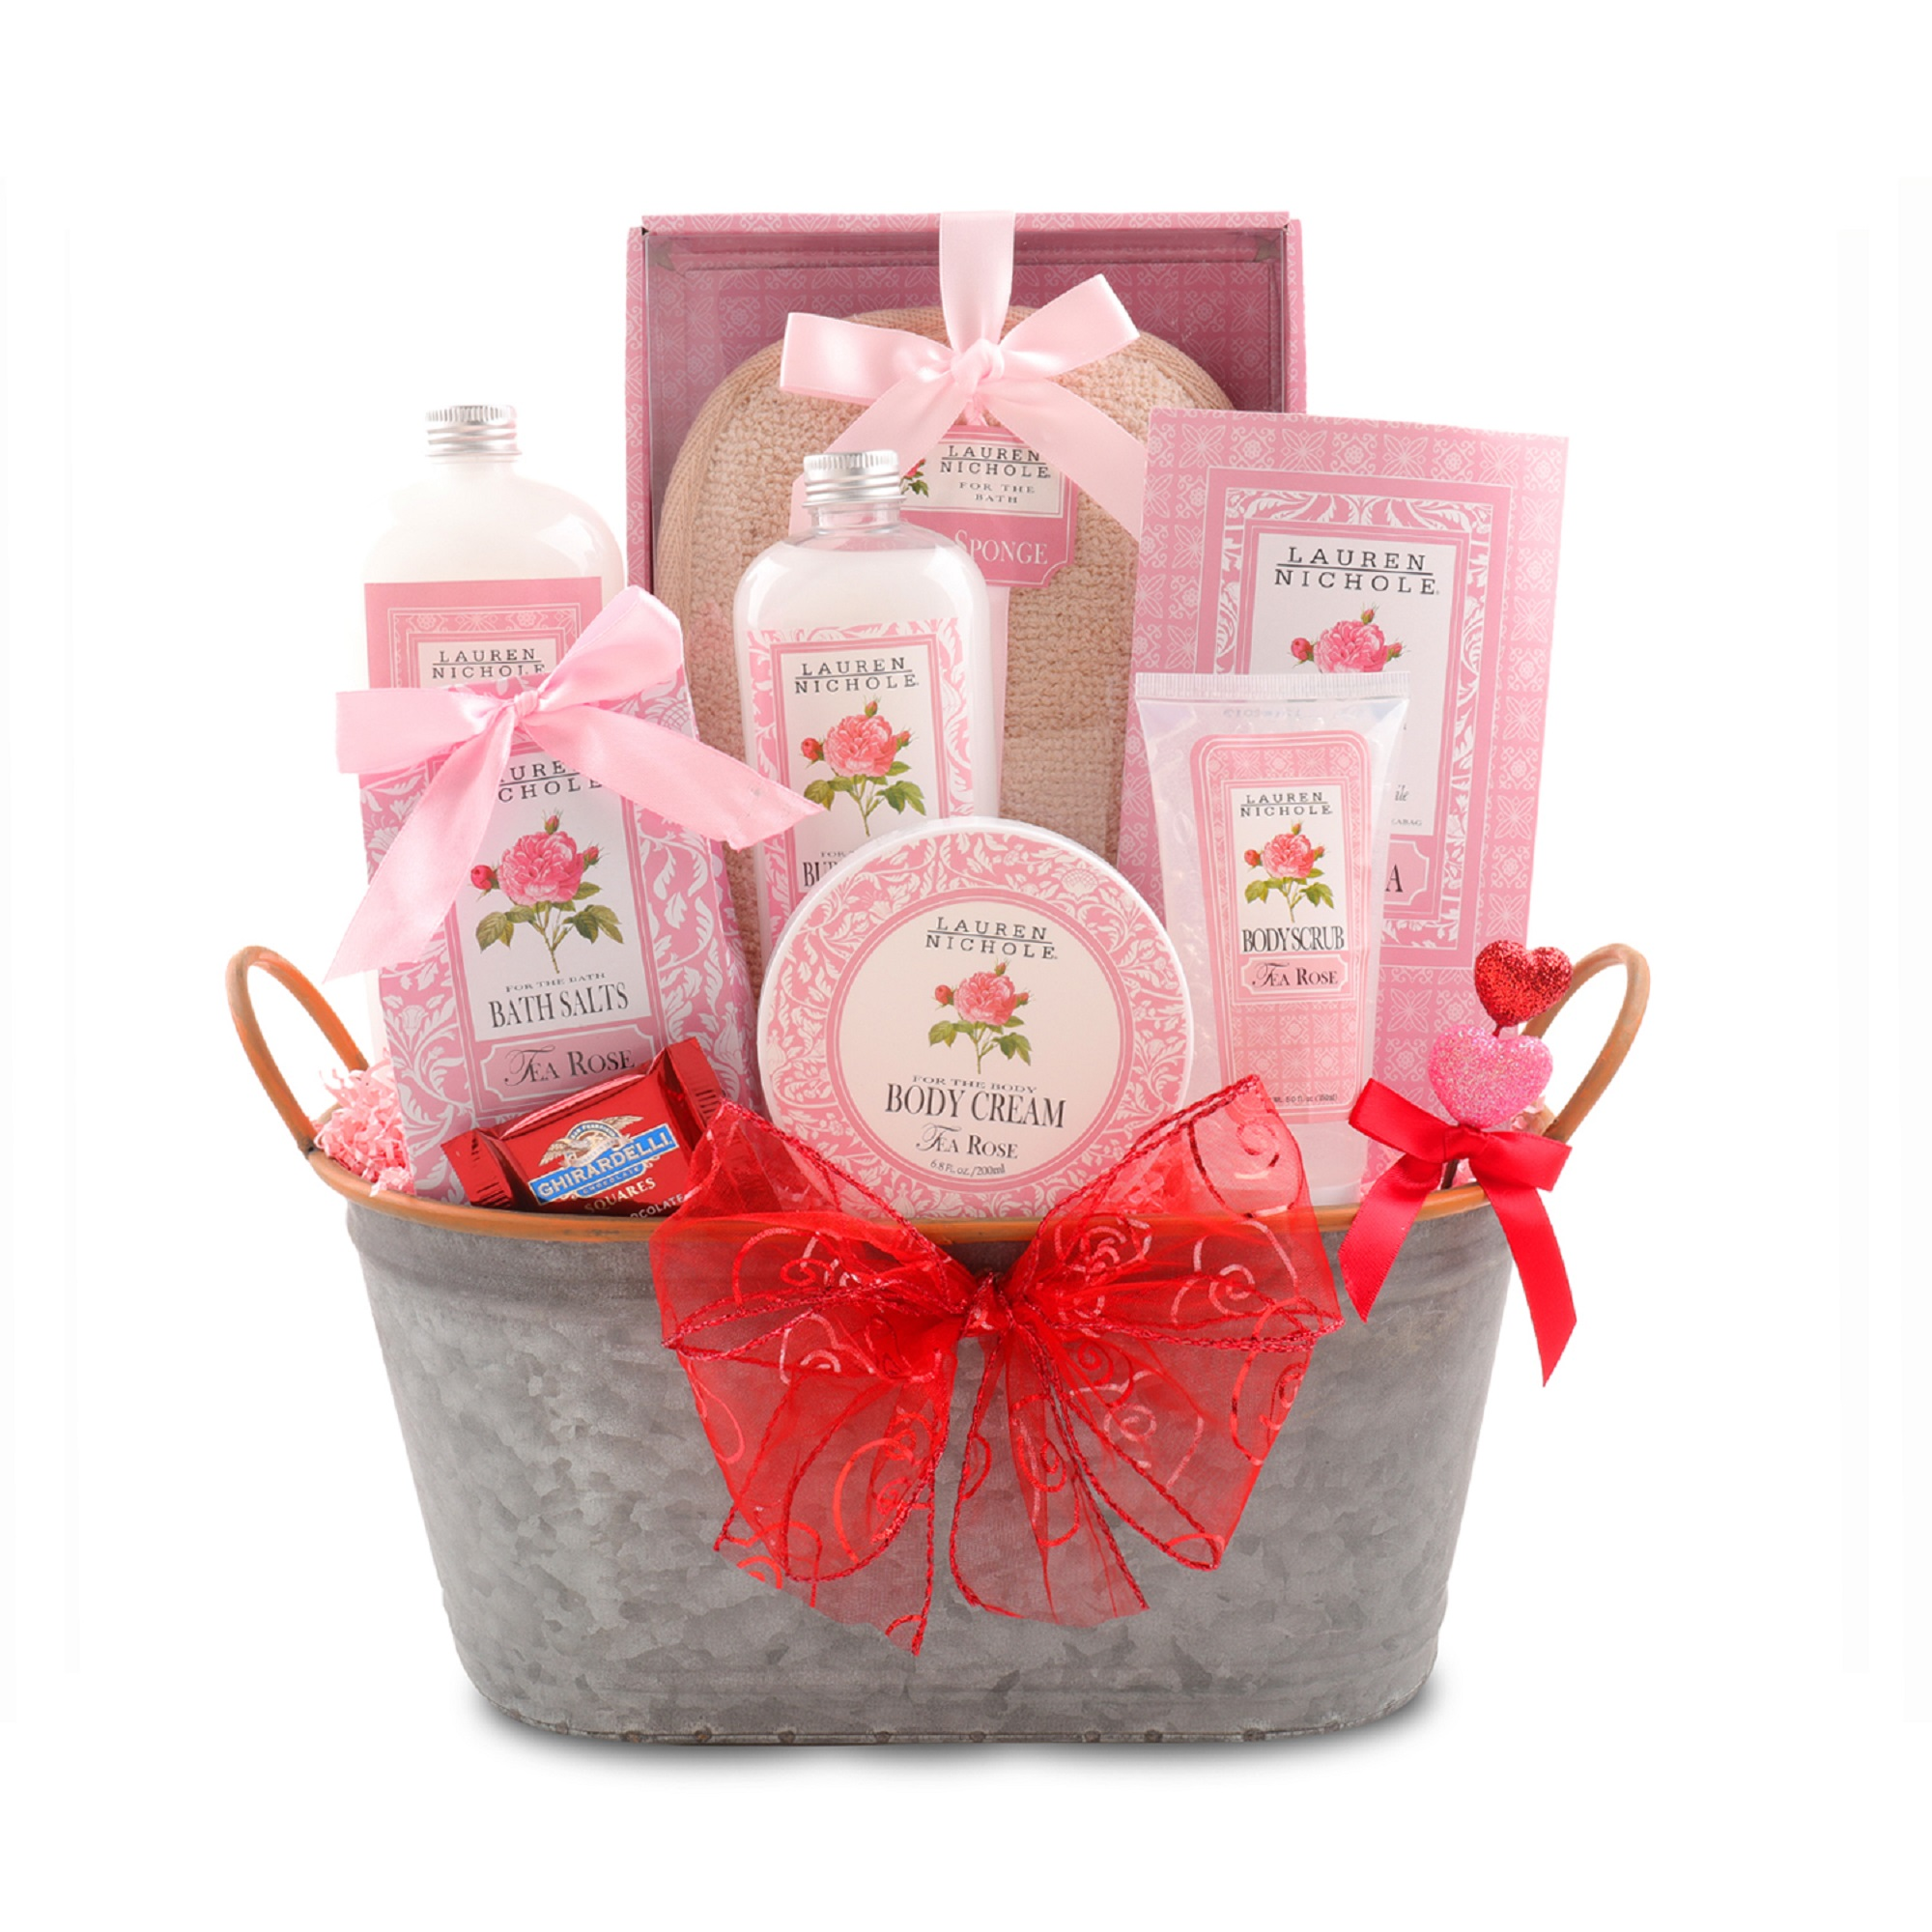 Alder Creek Gift Baskets Lauren Nichole Tea Rose Seasonal Gift Set, 12 pc